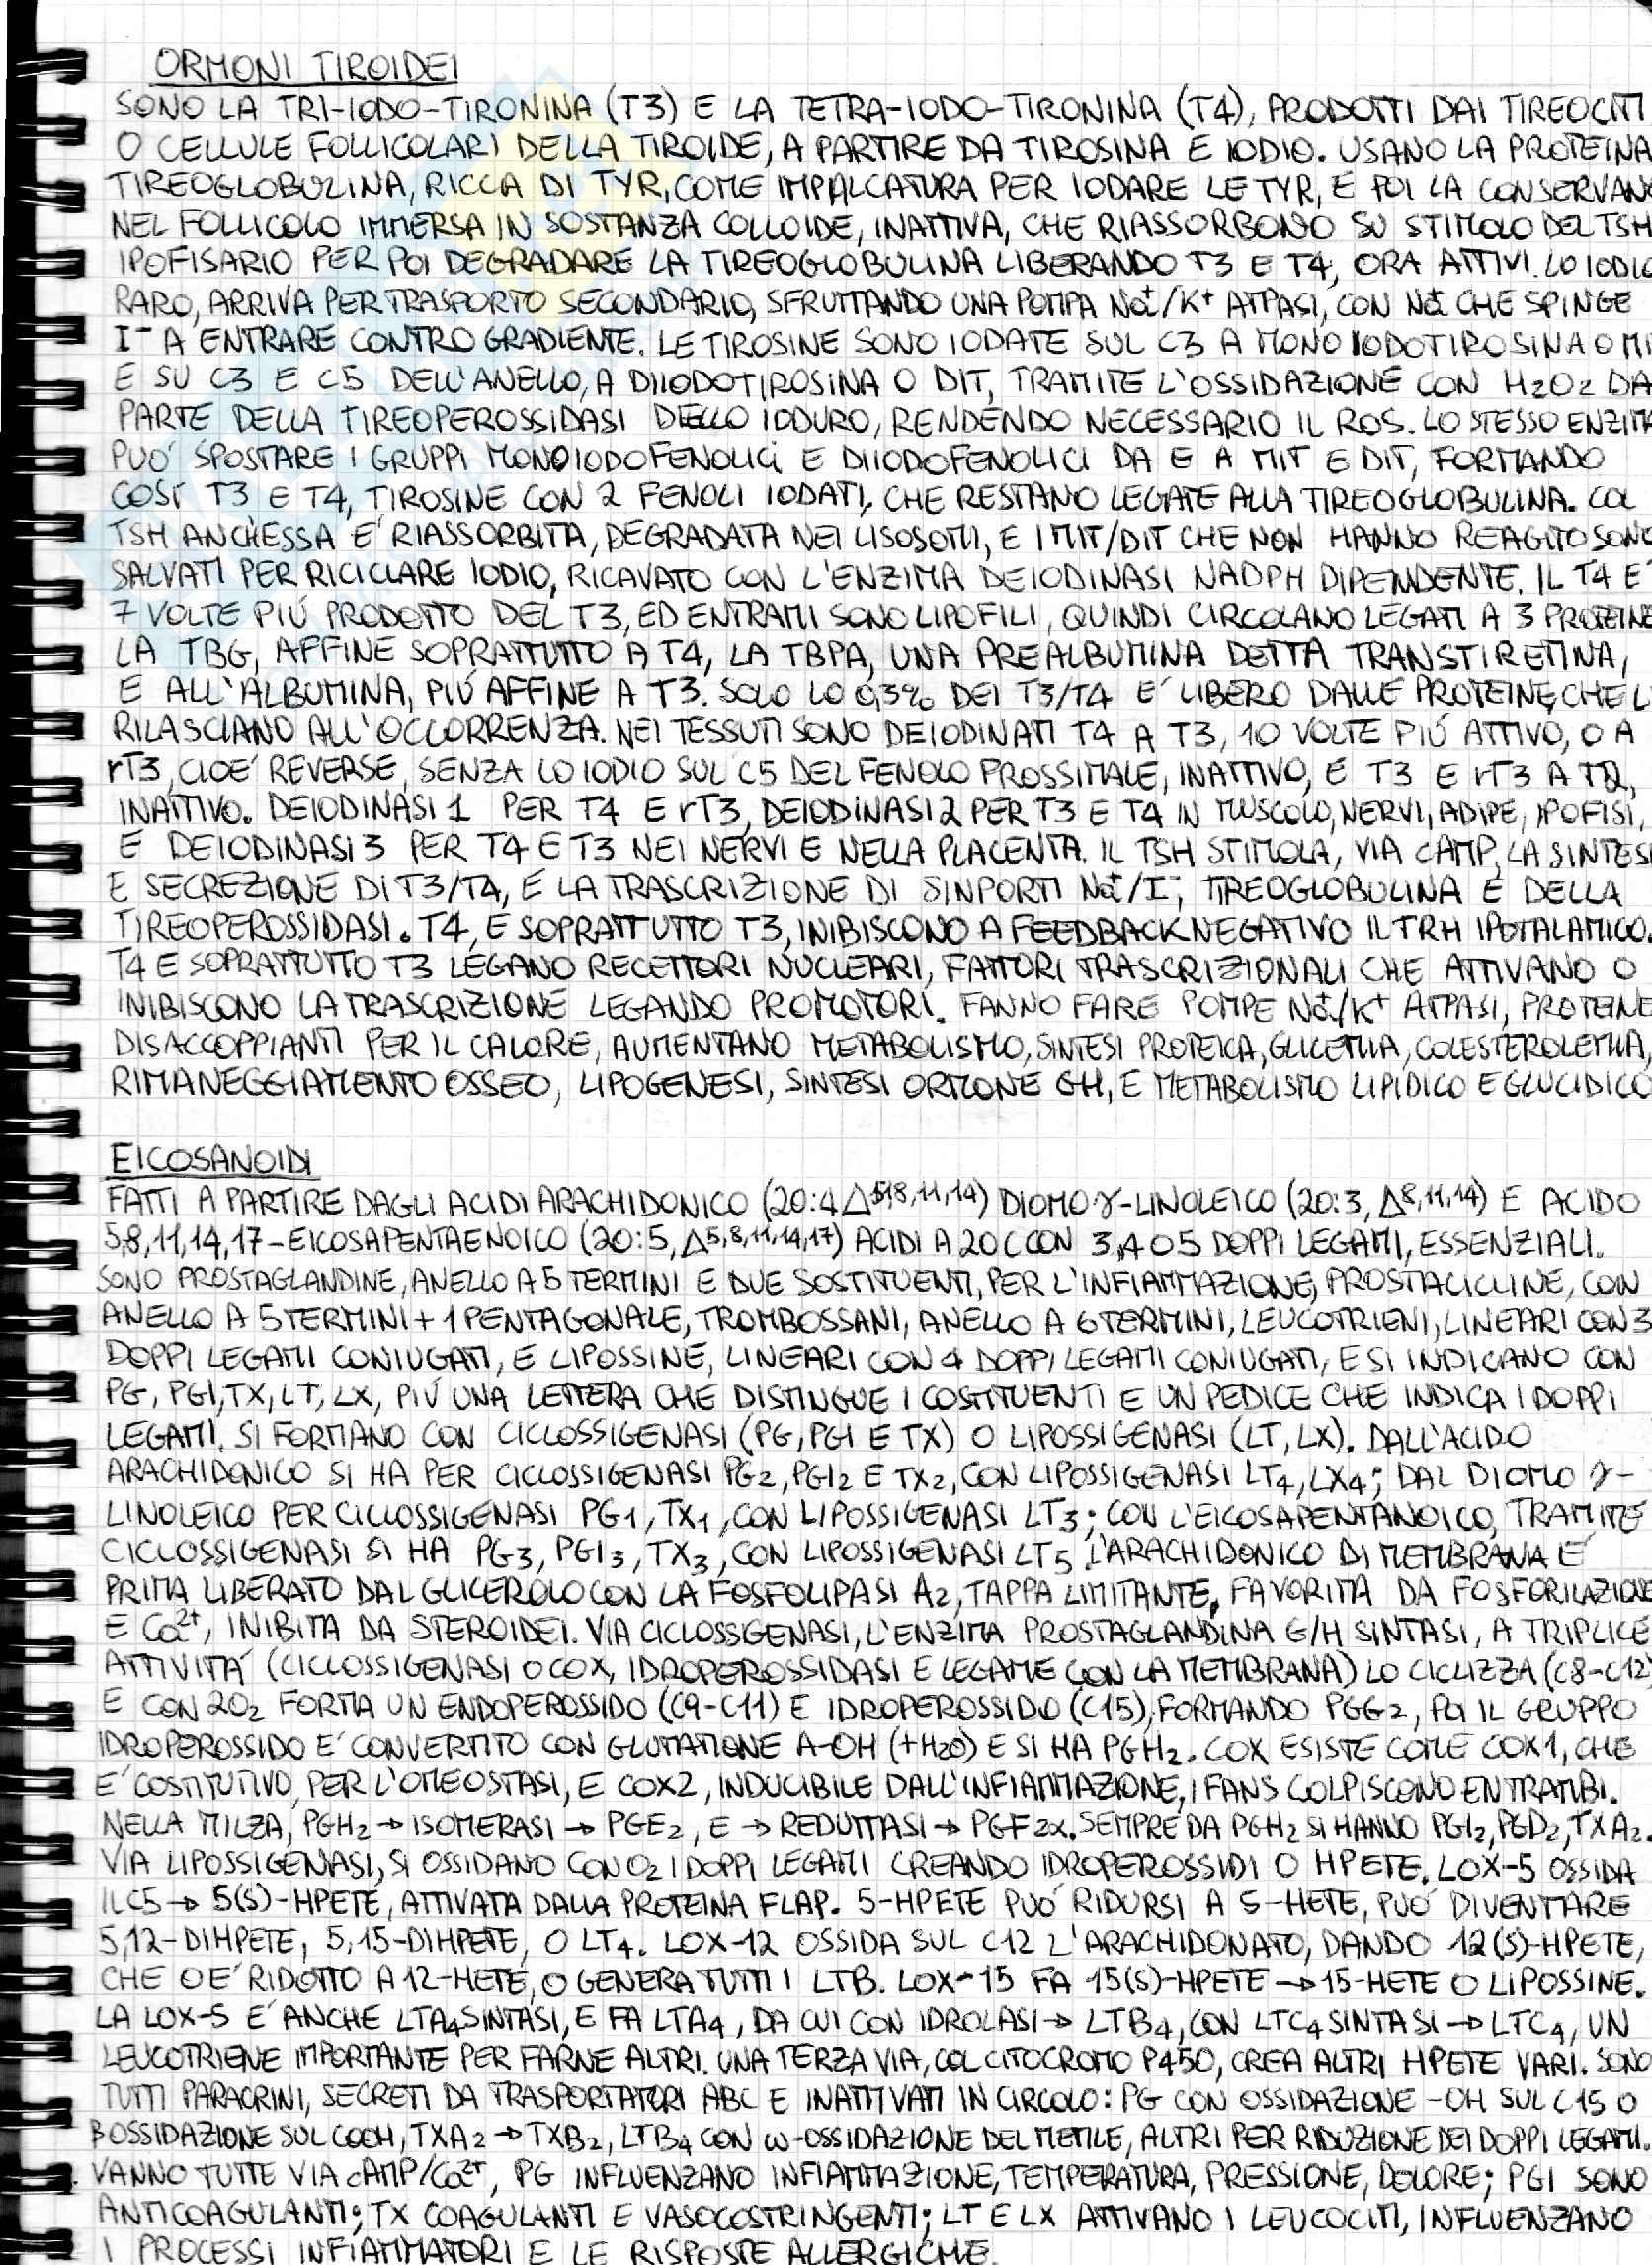 Riassunto esame Biochimica medica generale, prof. Chiarugi Pag. 26